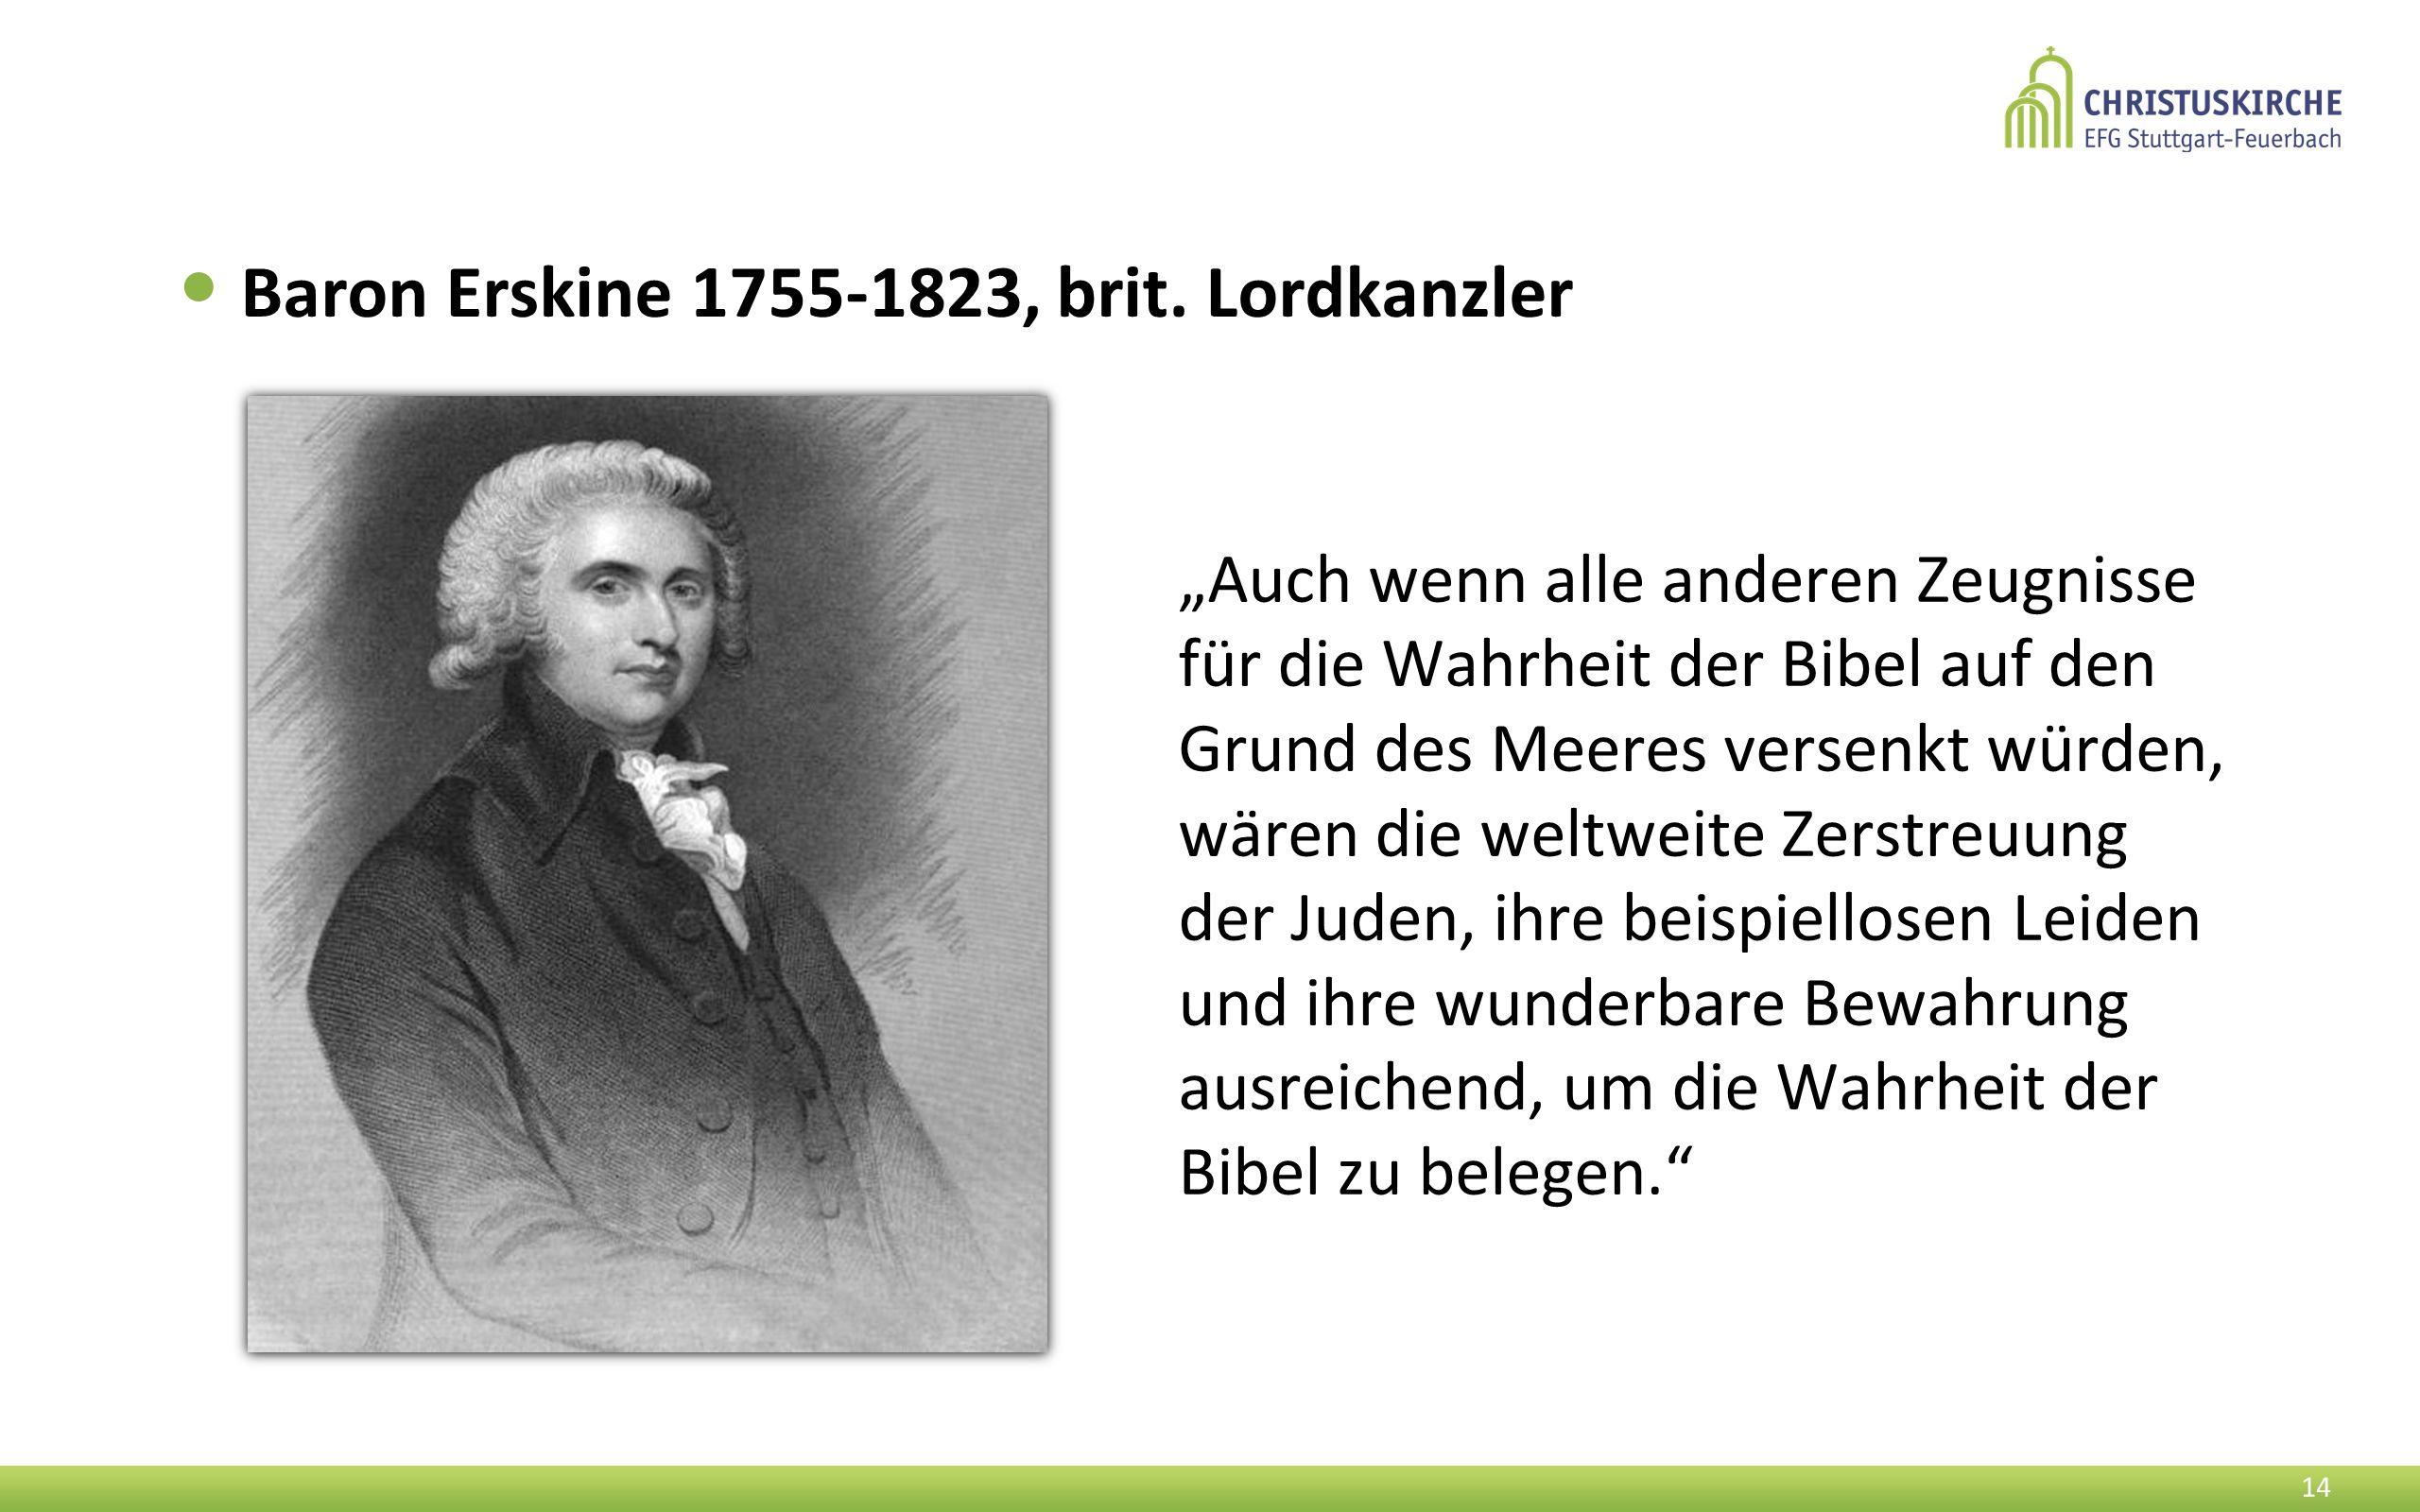 Baron Erskine 1755-1823, brit.